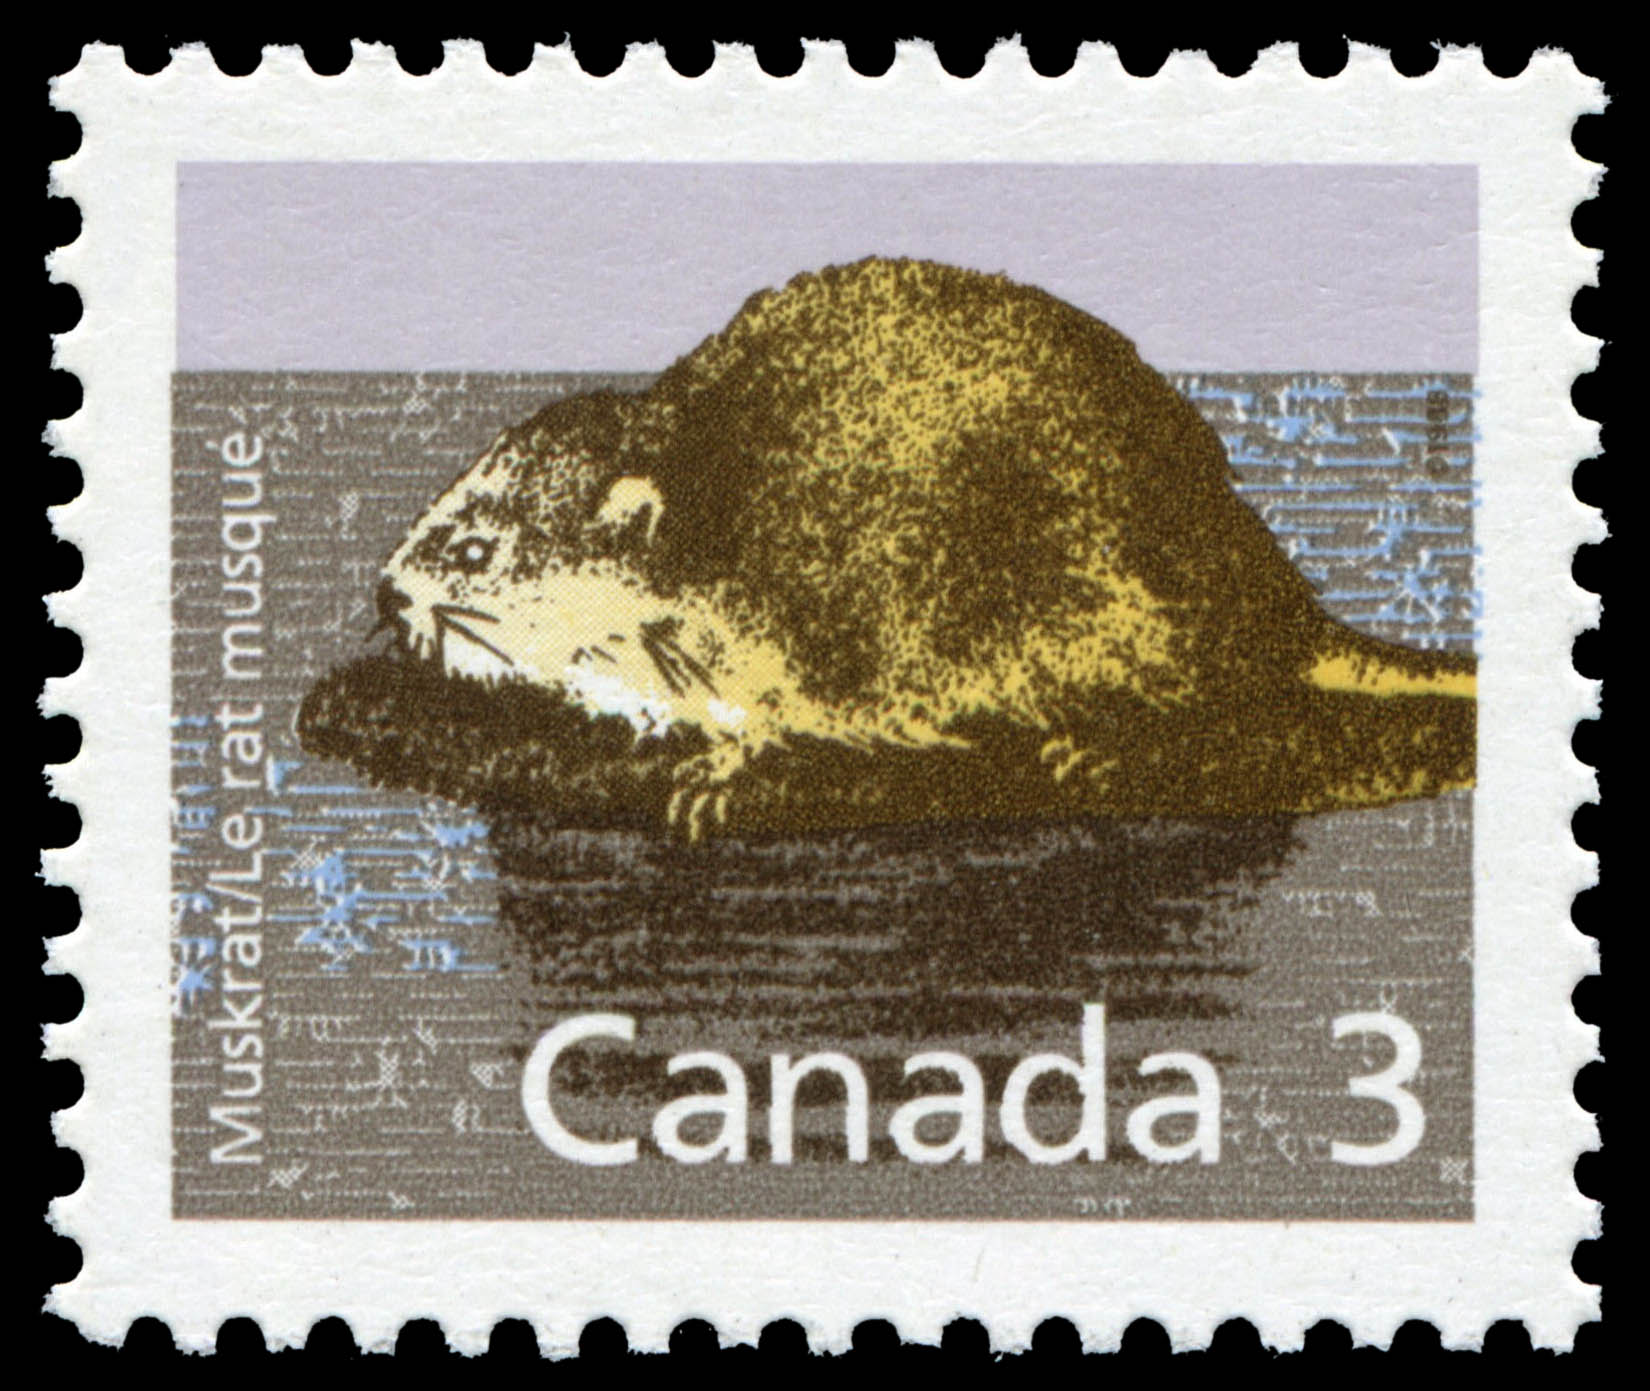 Muskrat Canada Postage Stamp